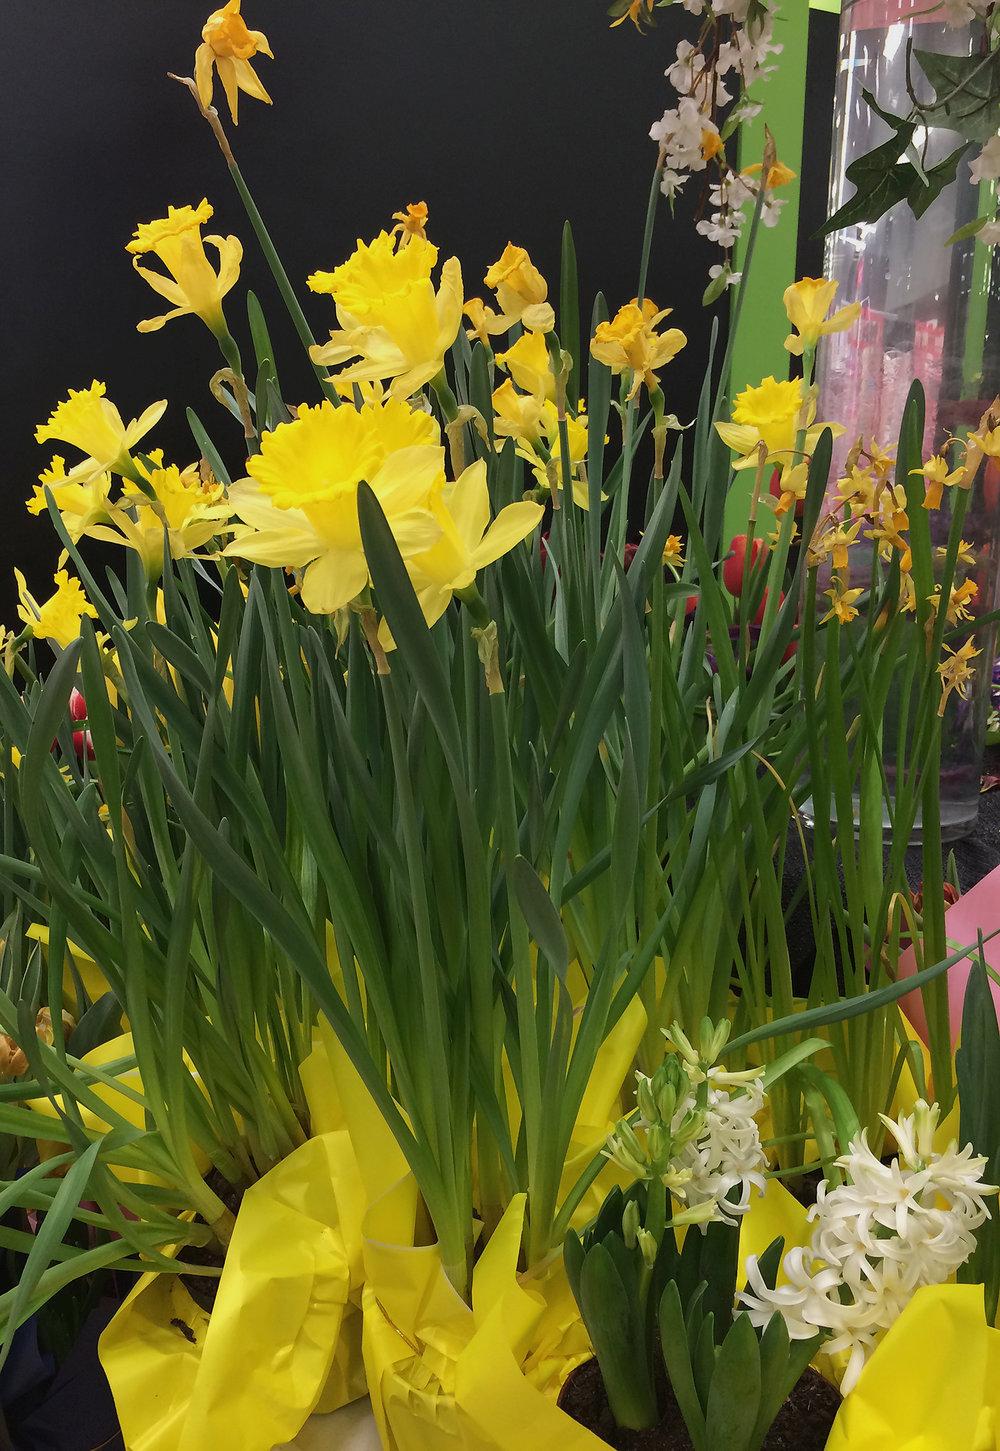 Daffodil-nursery-Squarespace-IMG_2931.jpg